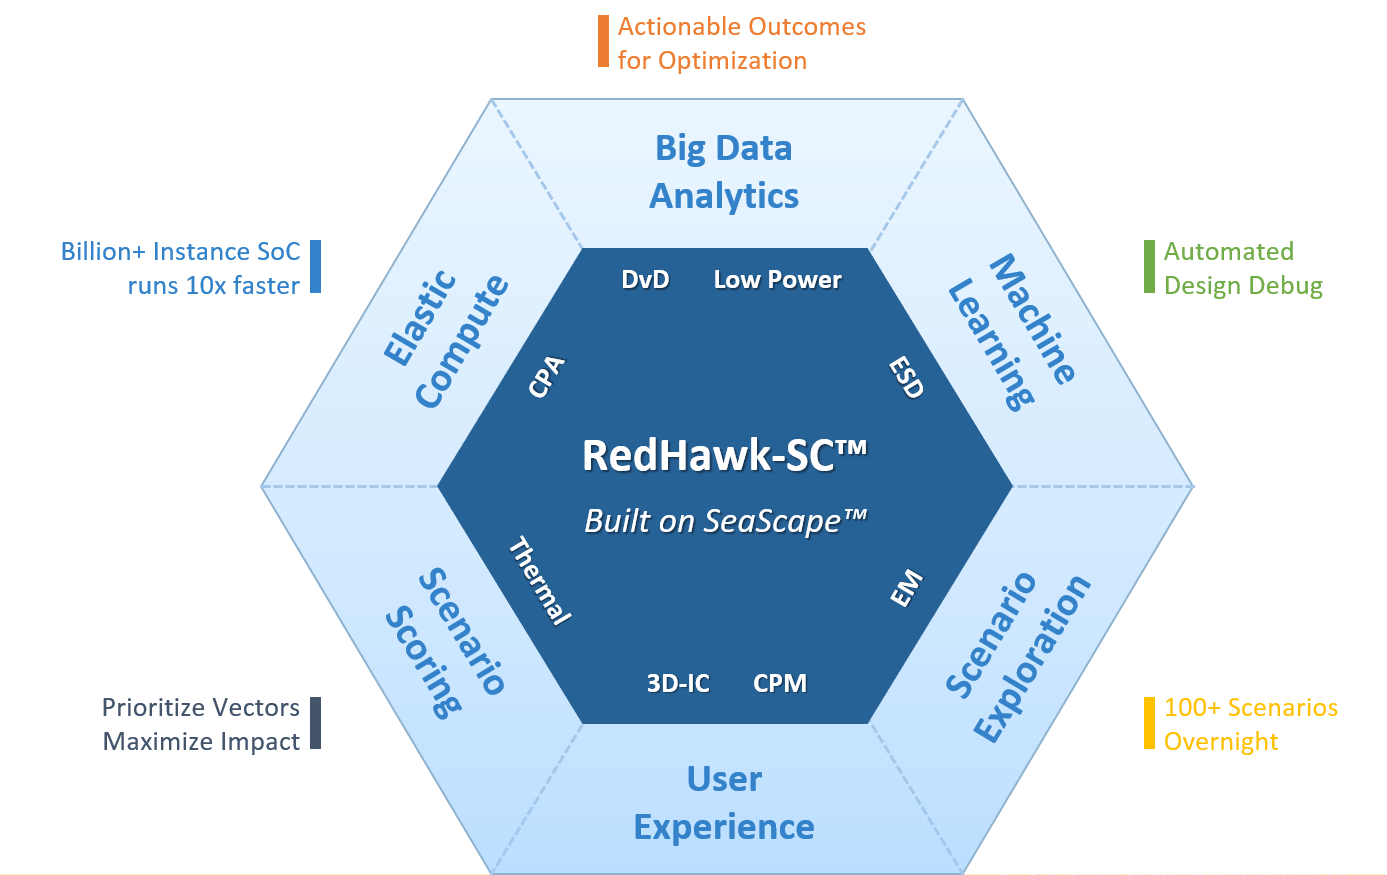 RedHawk-SC